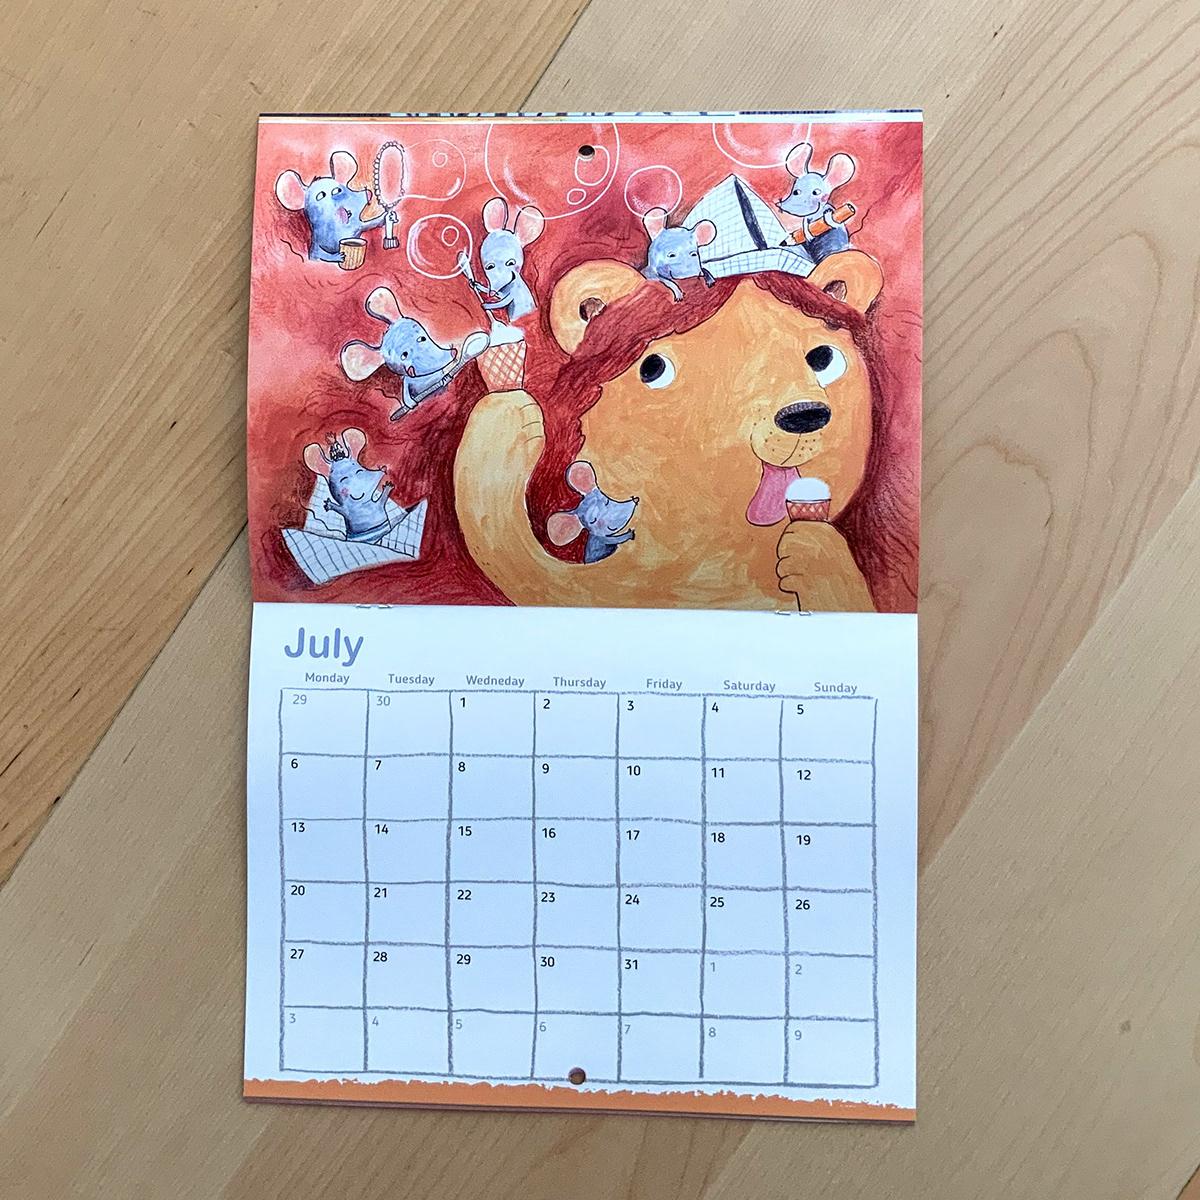 Image may contain: cartoon, child art and handmade